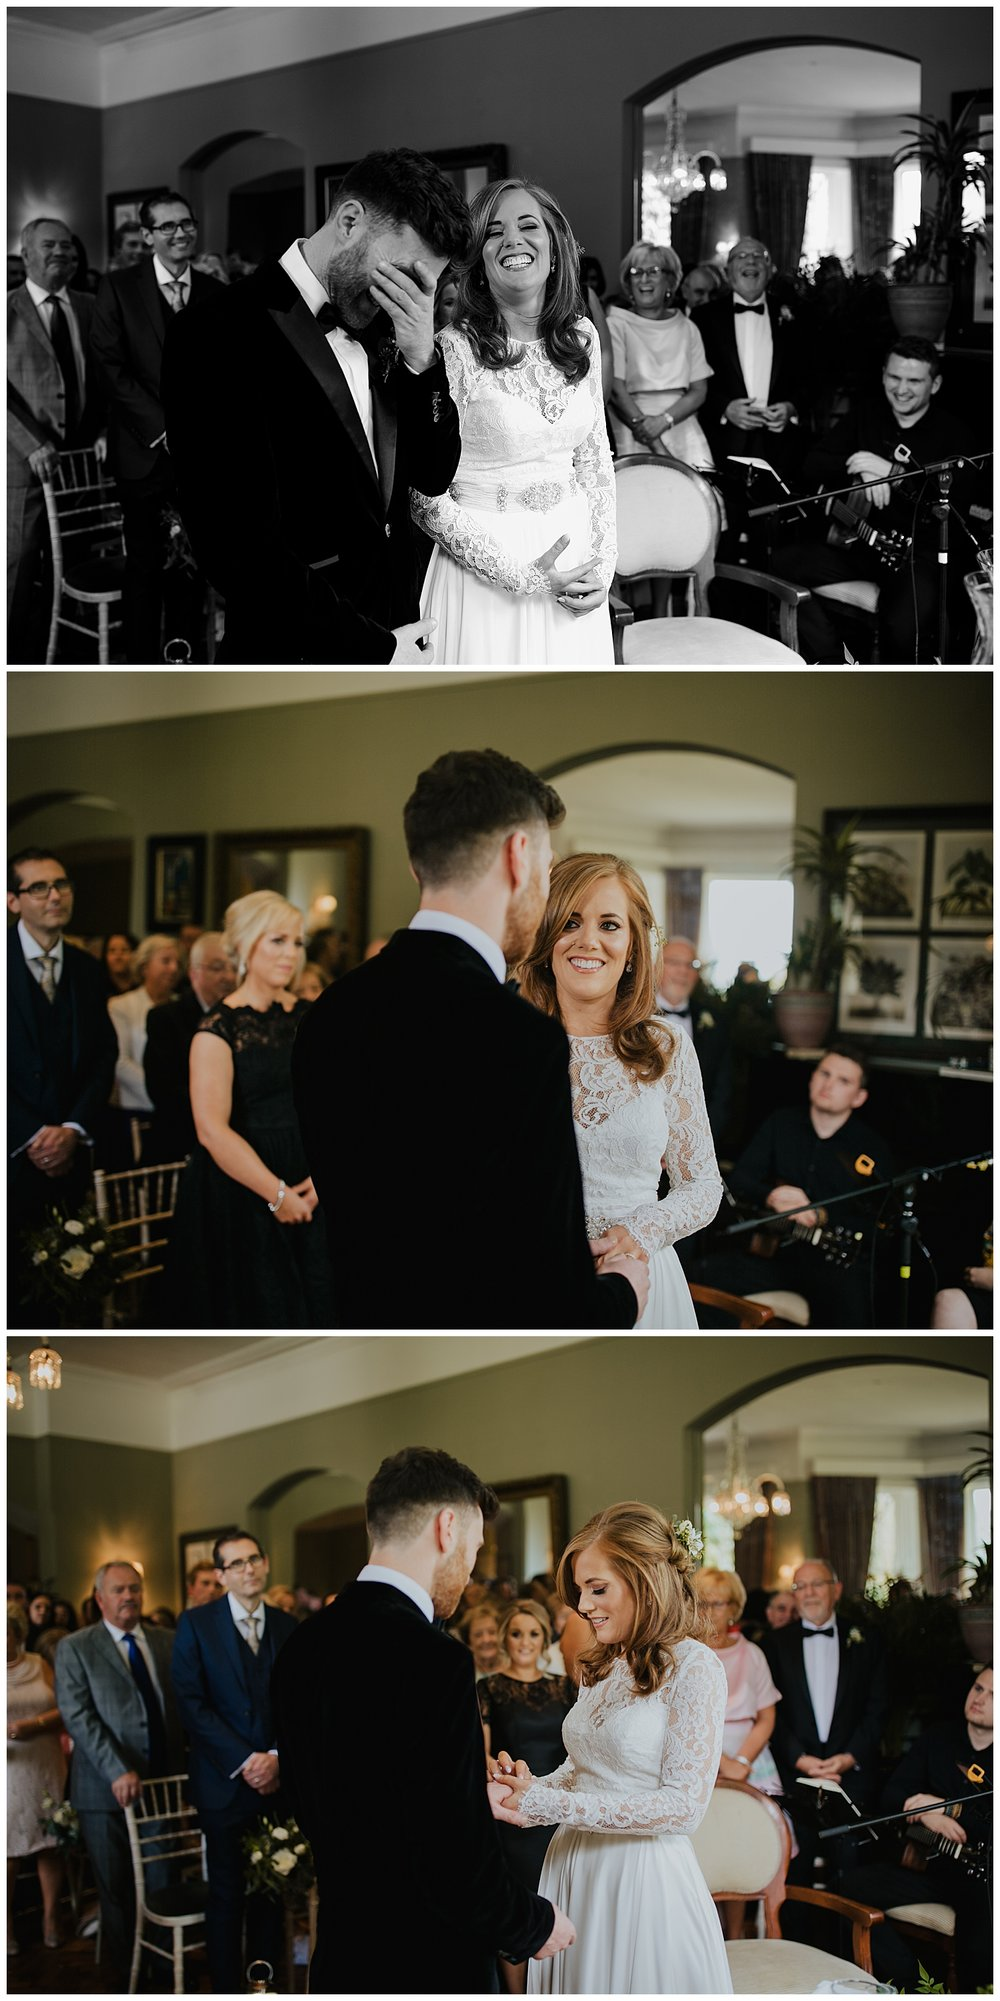 a&c_tinakilly_black_tie_wedding_photographer_livia_figueiredo_105.jpg